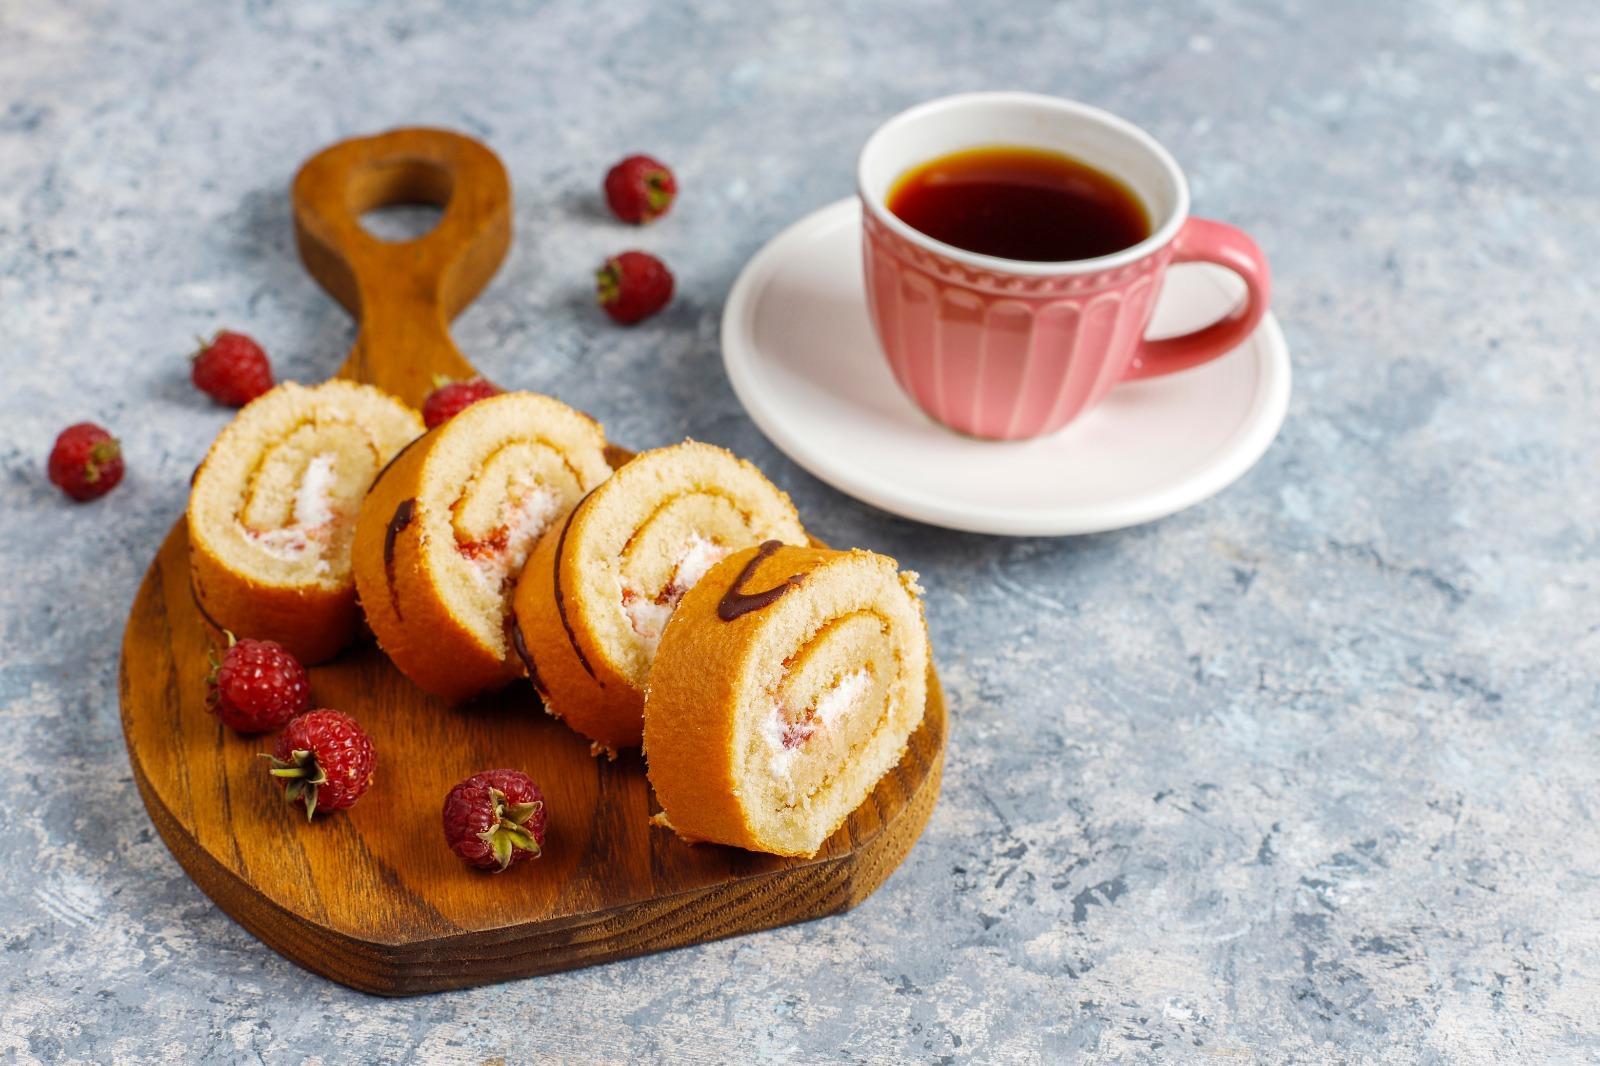 Pasta severlere vazgeçilmez bir lezzet olan muzlu rulo pasta tarifi.